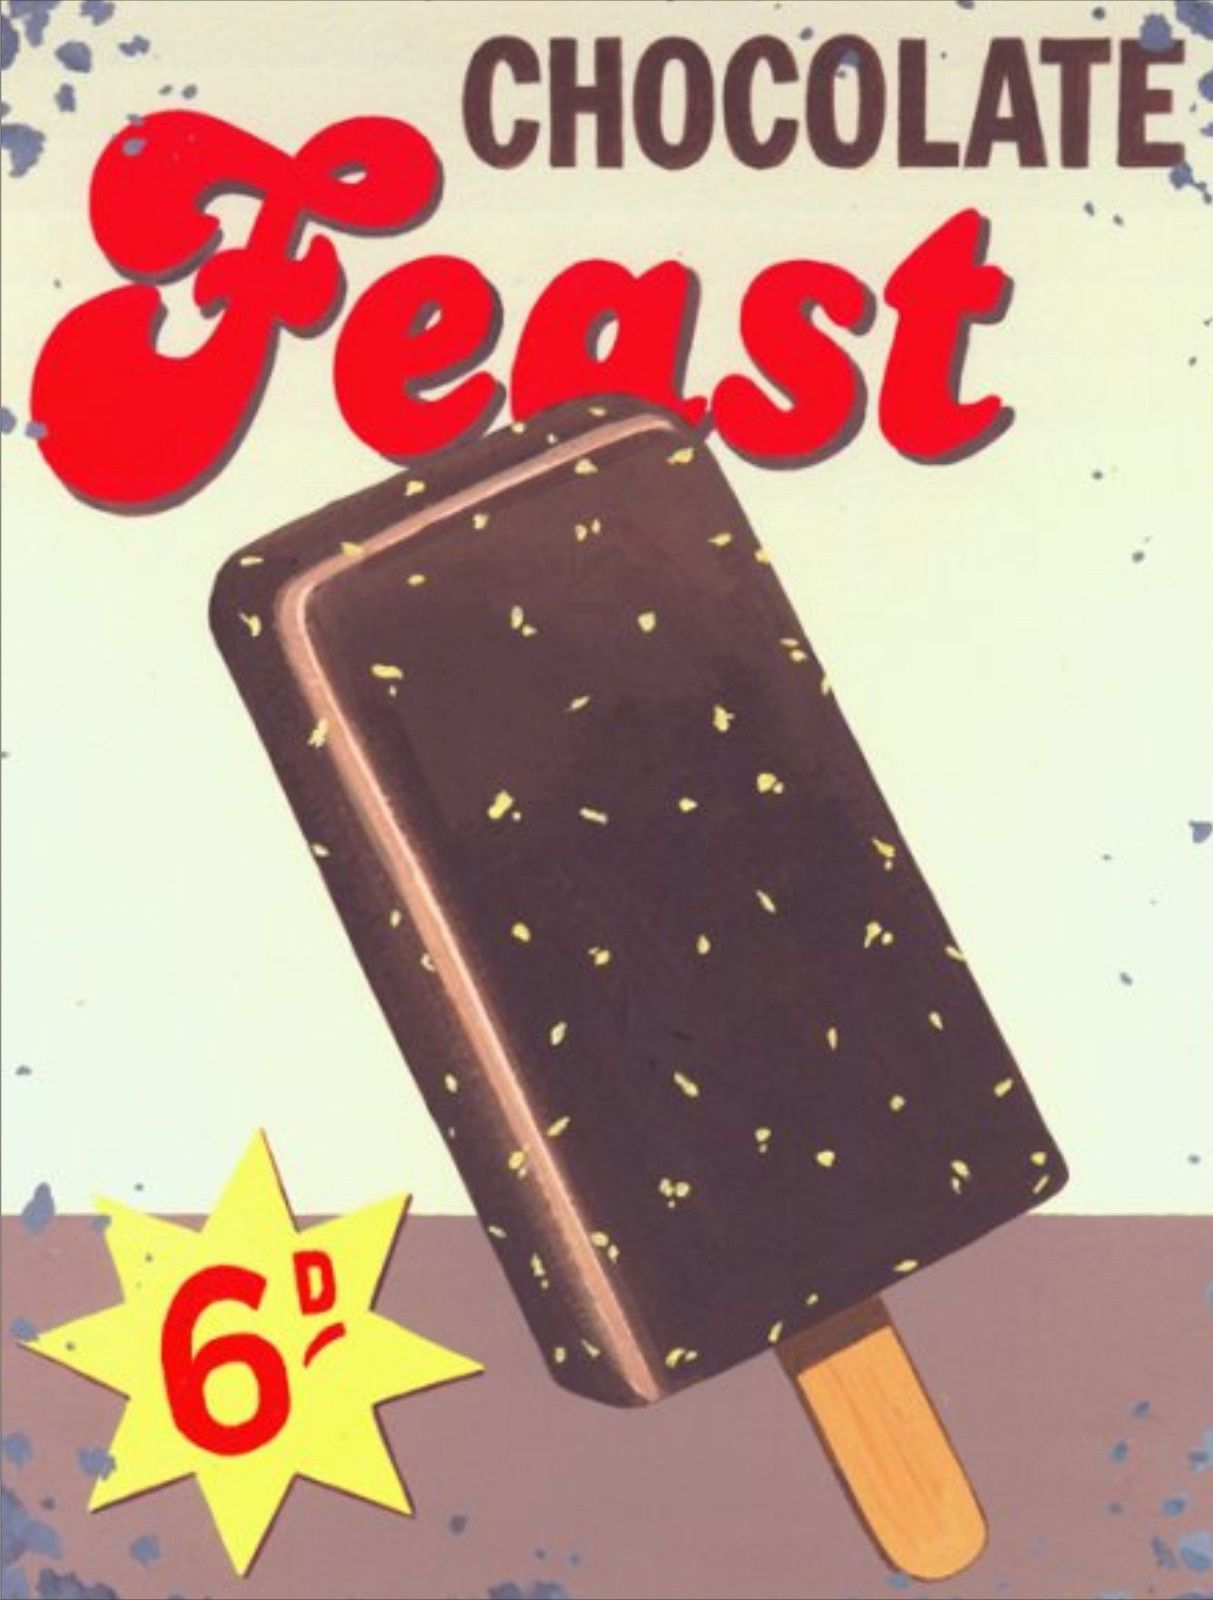 New Retro Feast Ice Cream 89 Vintage Style Metal Wall Plaque